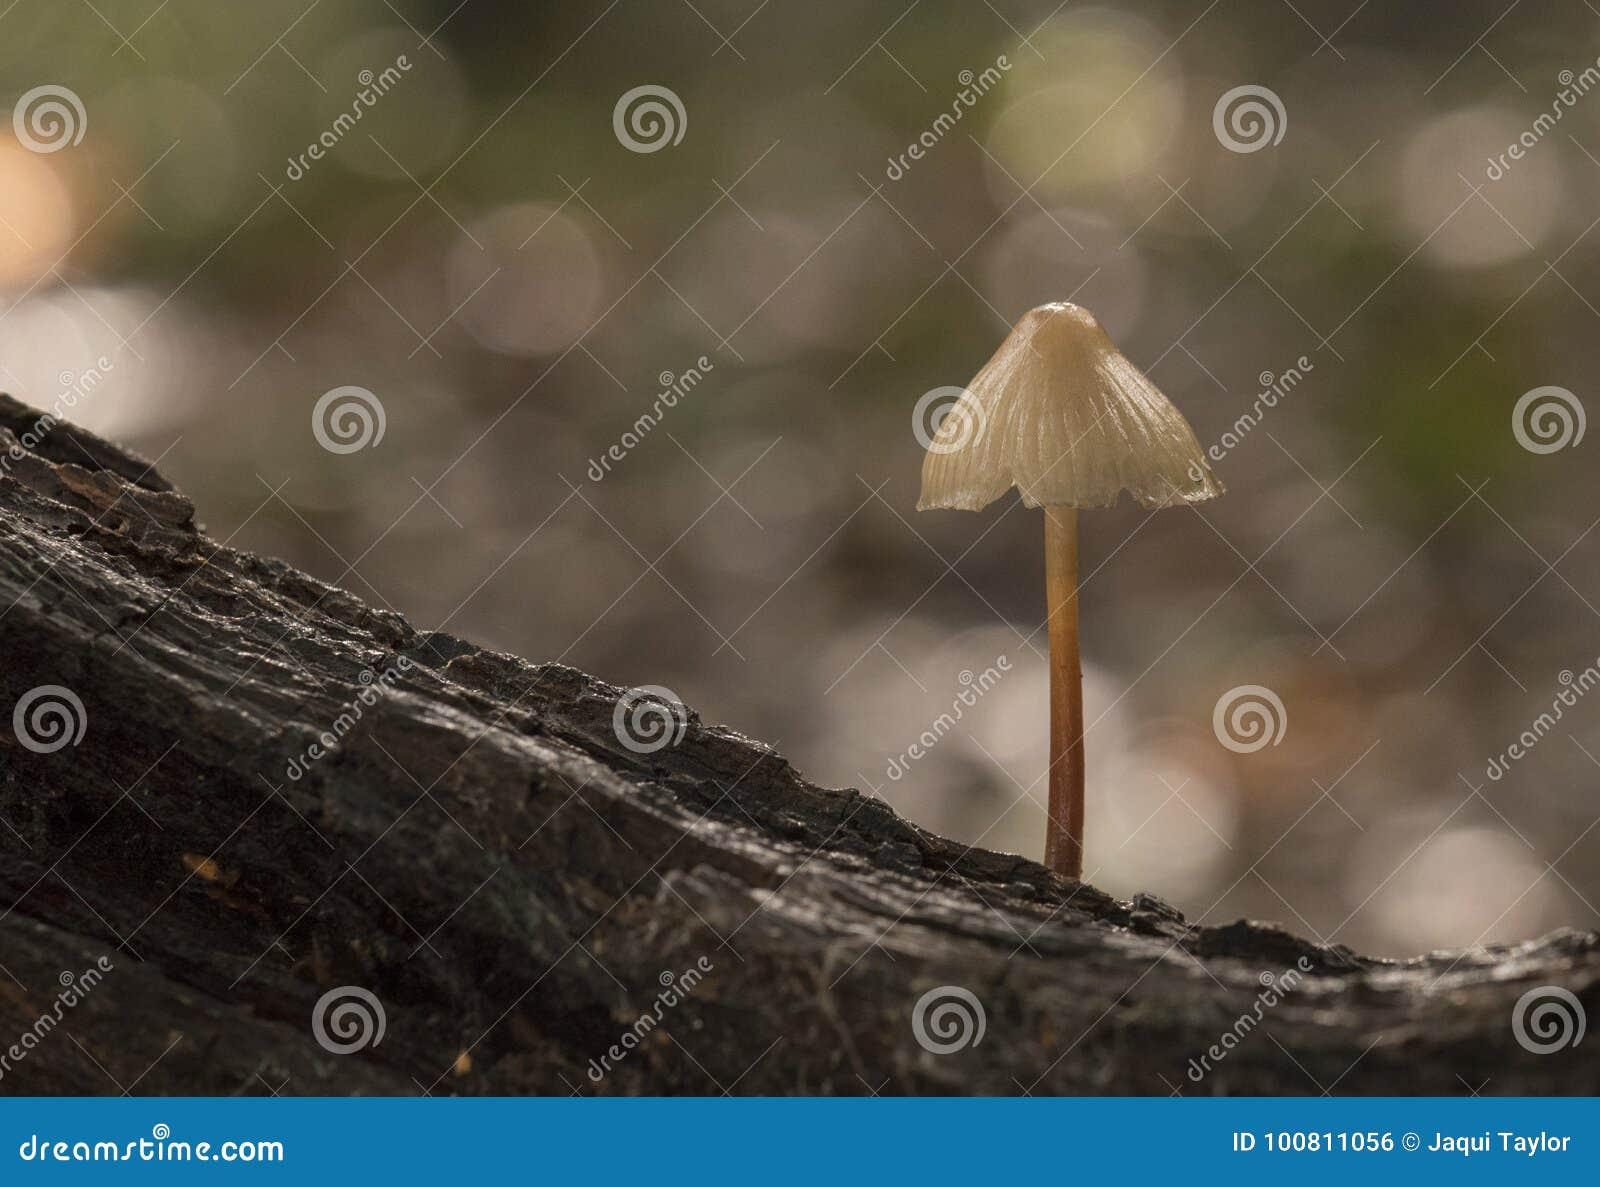 A small mushroom, Southampton Common